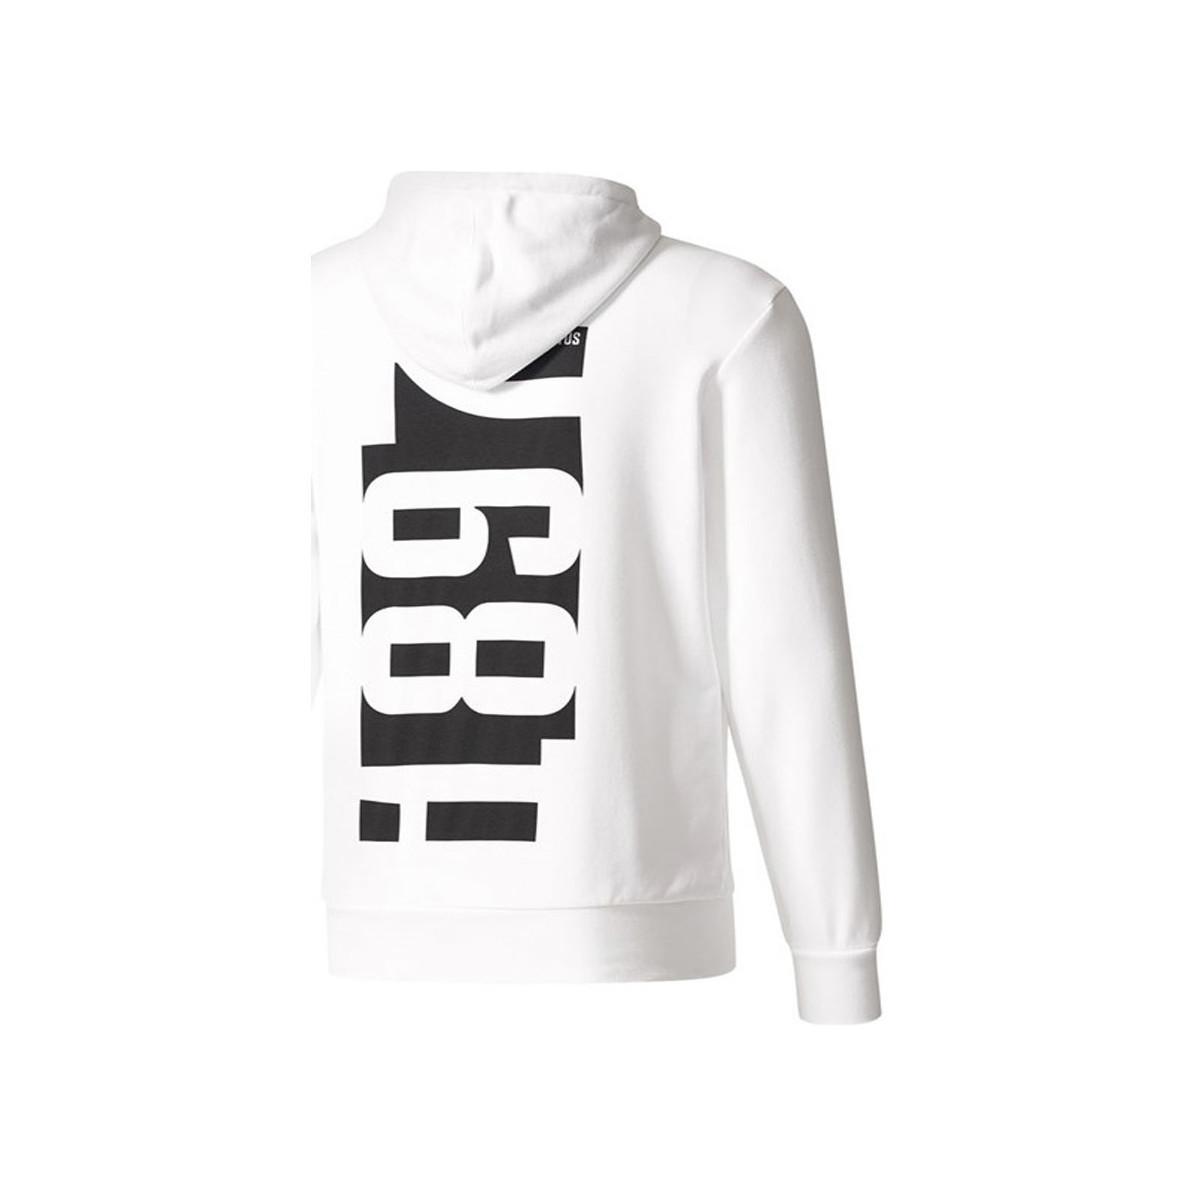 cb887f1f1 adidas 2017-2018 Juventus Hooded Top Men s Sweatshirt In White in ...